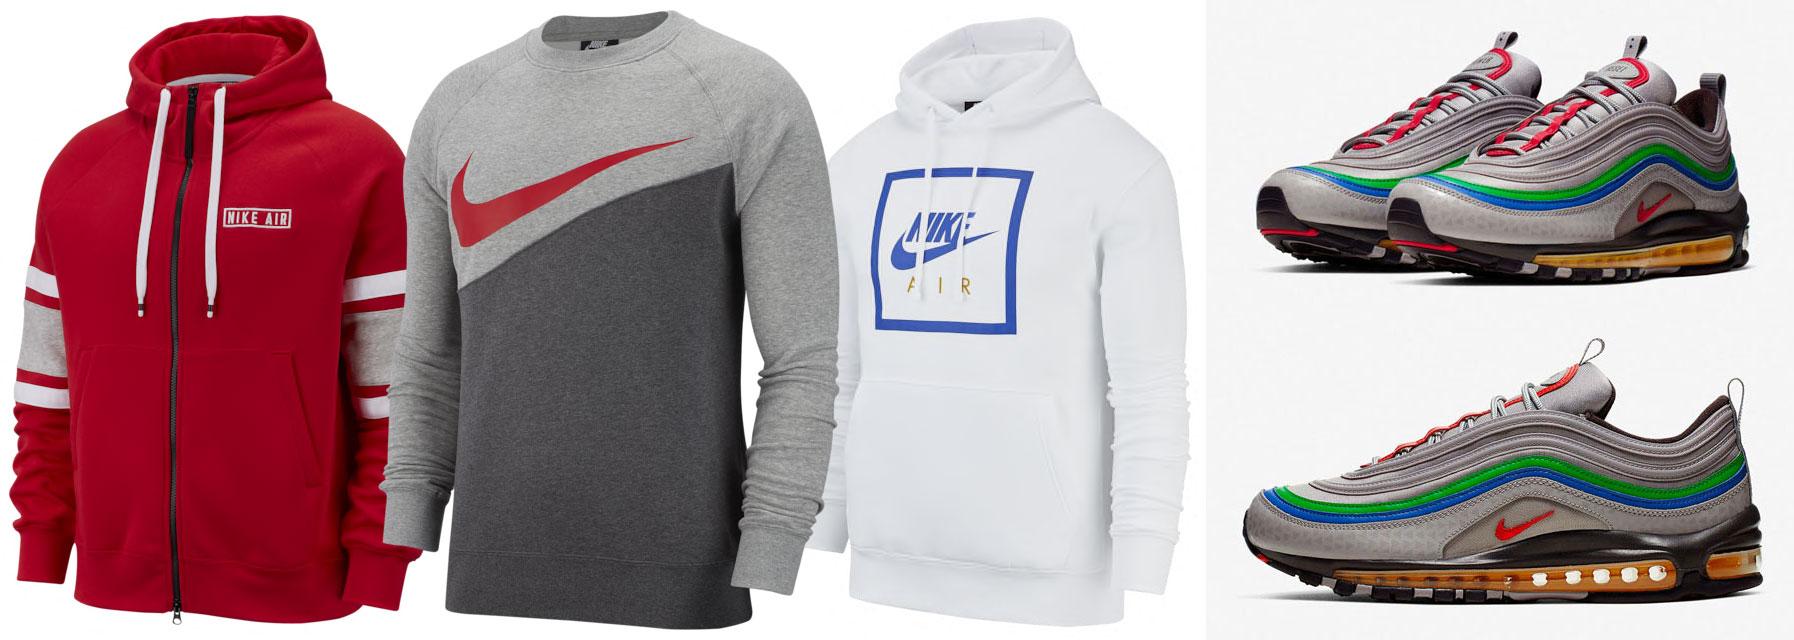 nike-air-max-97-nintendo-64-matching-hoodies-sweatshirts